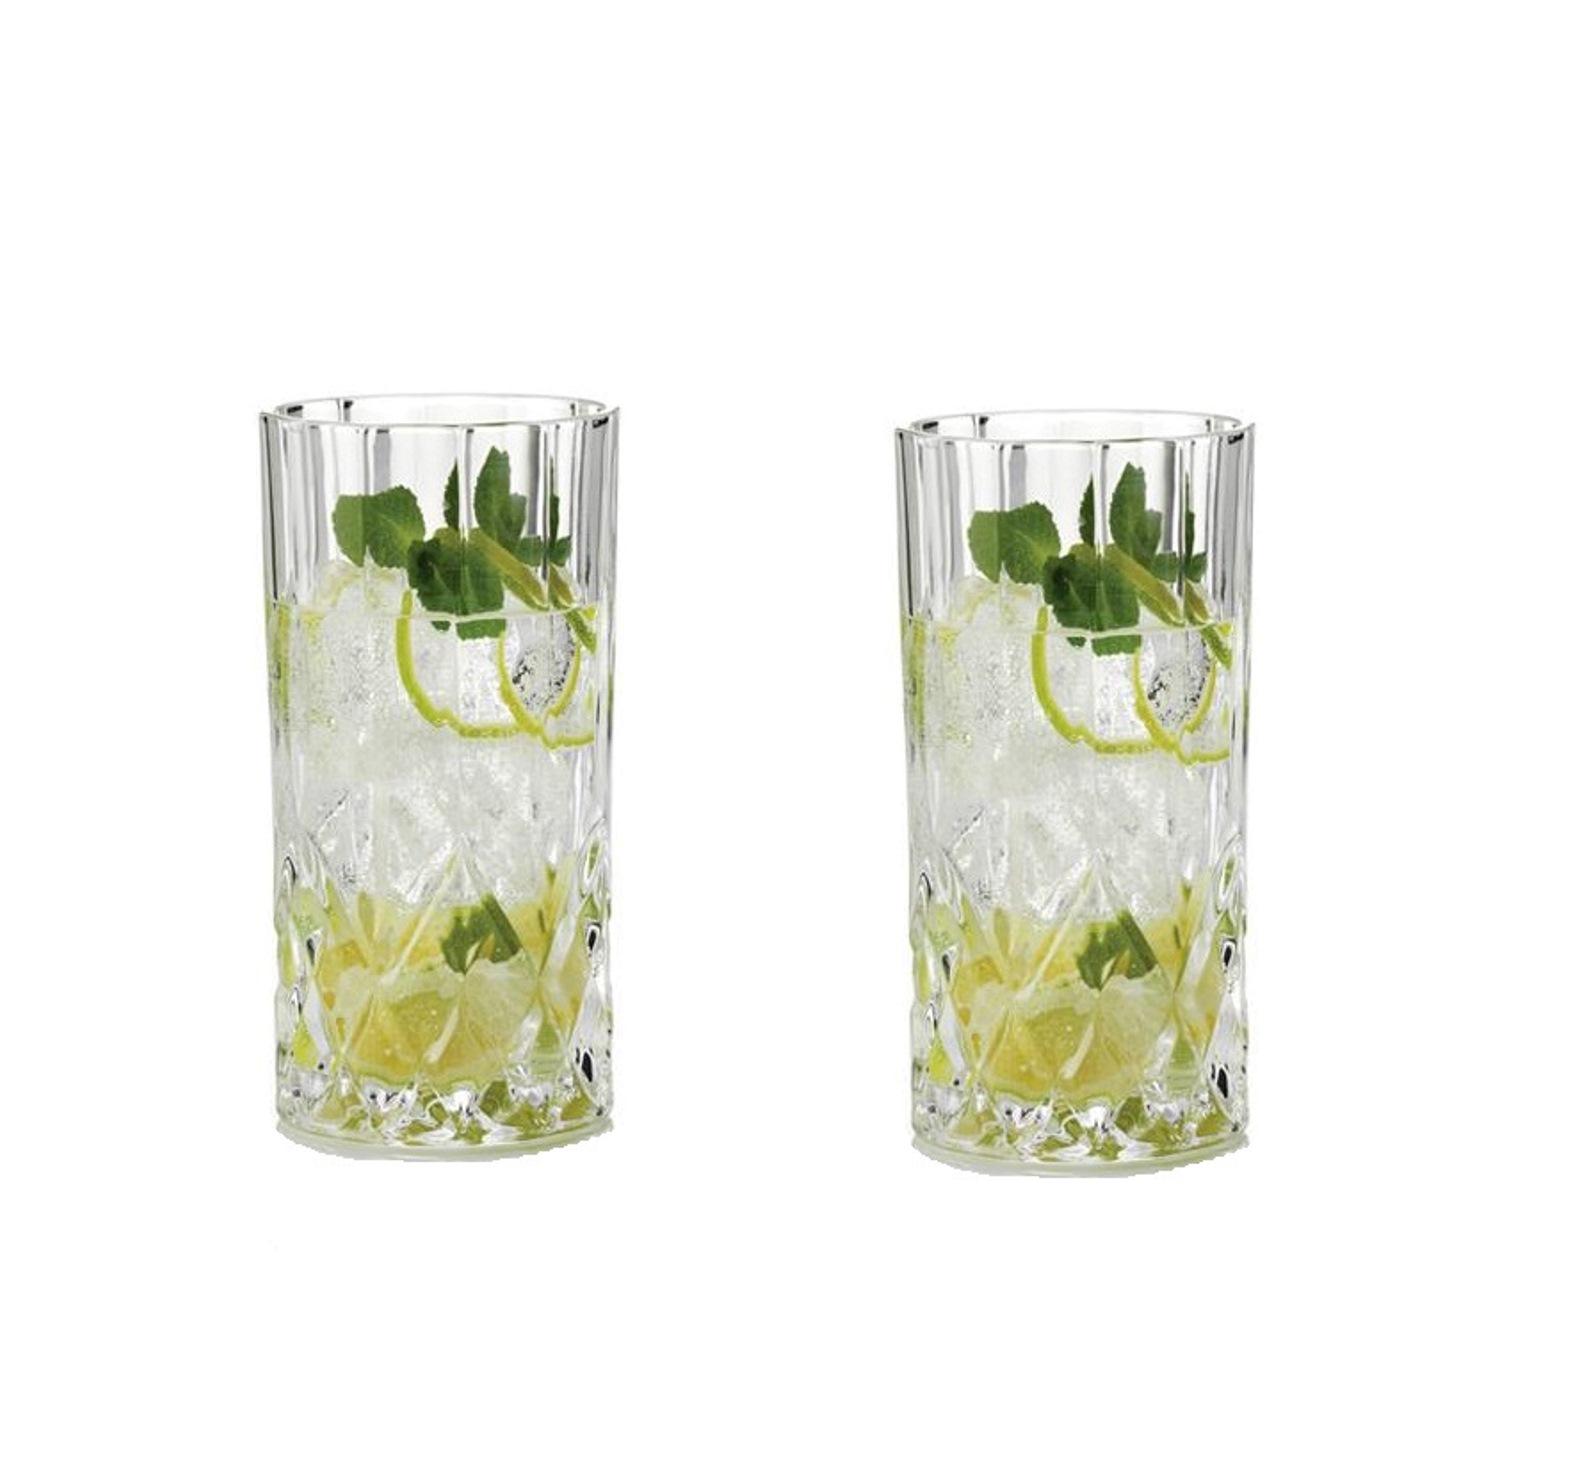 Онлайн каталог PROMENU: Набор стаканов Aida HARVEY, объем 0,36 л, прозрачный, 2 штуки Aida 80310